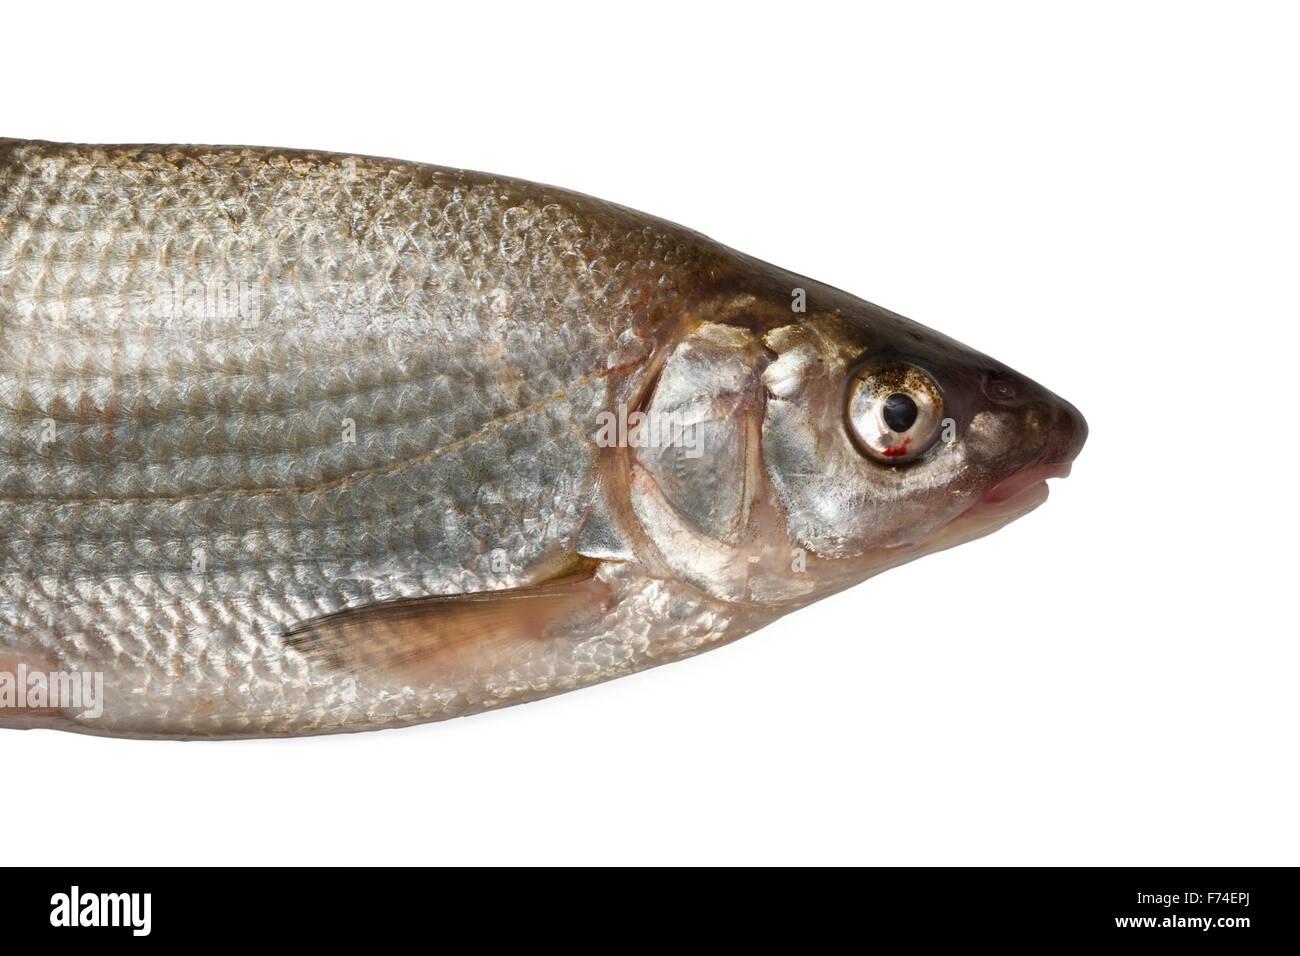 Nase fish Stock Photo